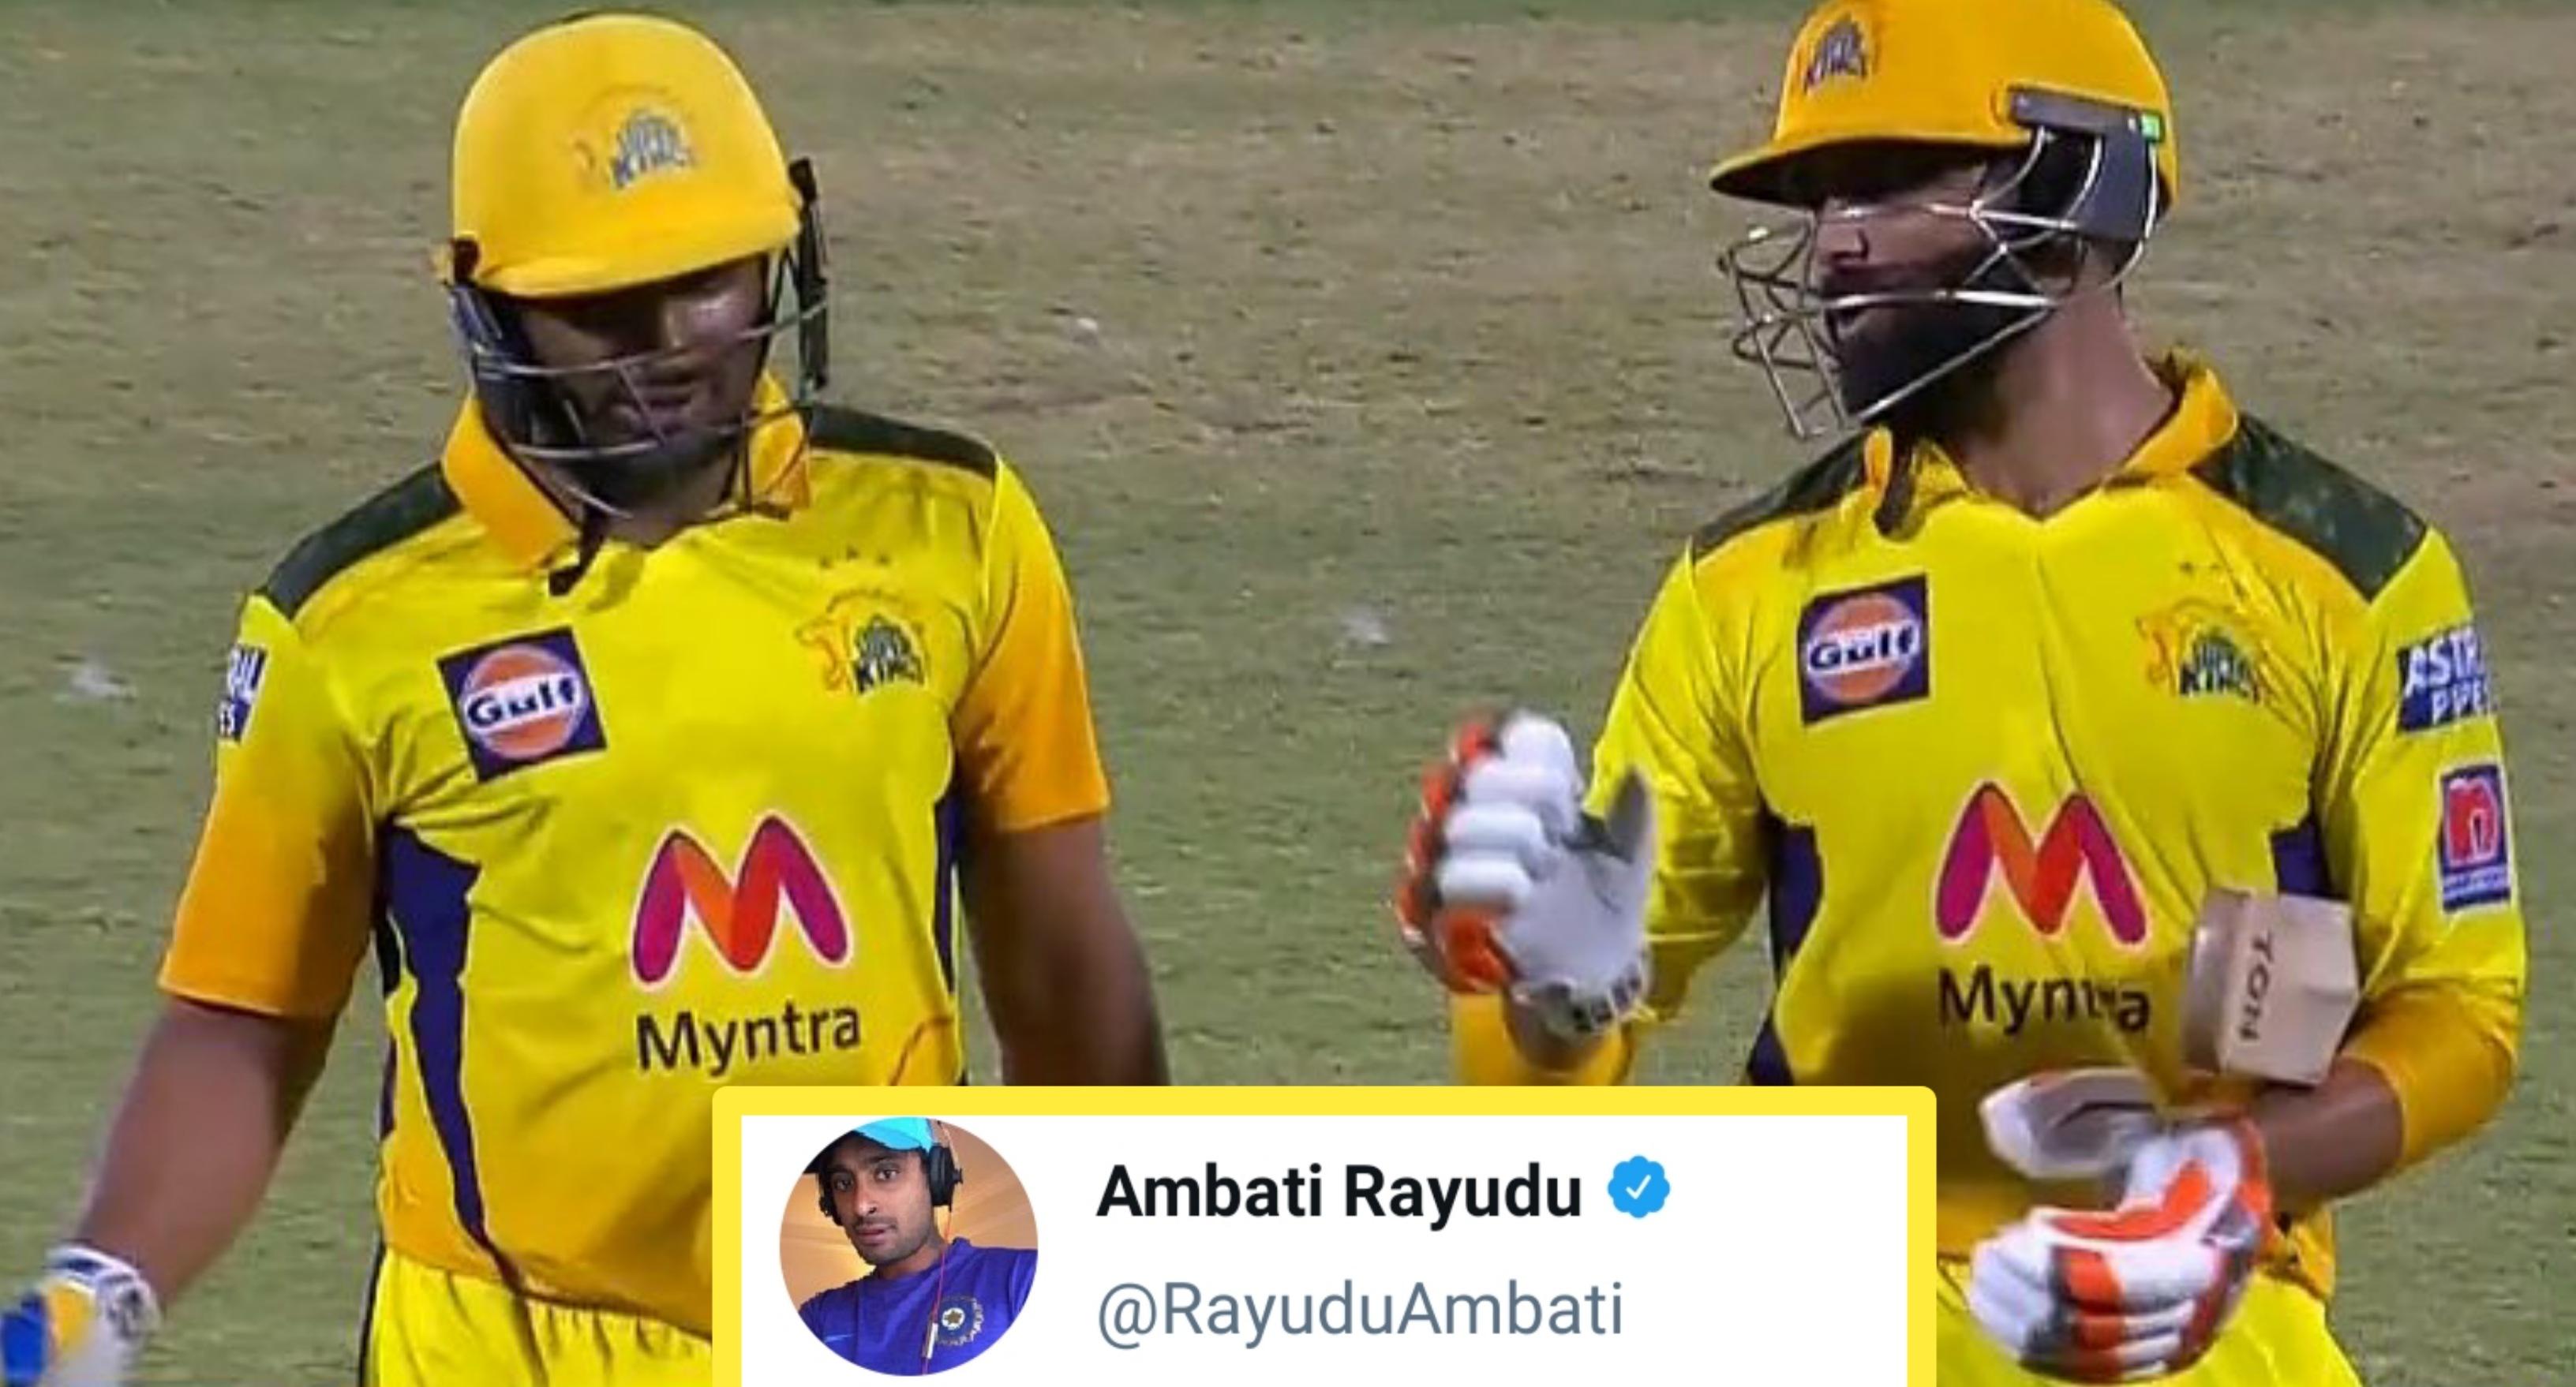 Old tweet of Ambati Rayudu goes viral after 72*(27) vs. MI